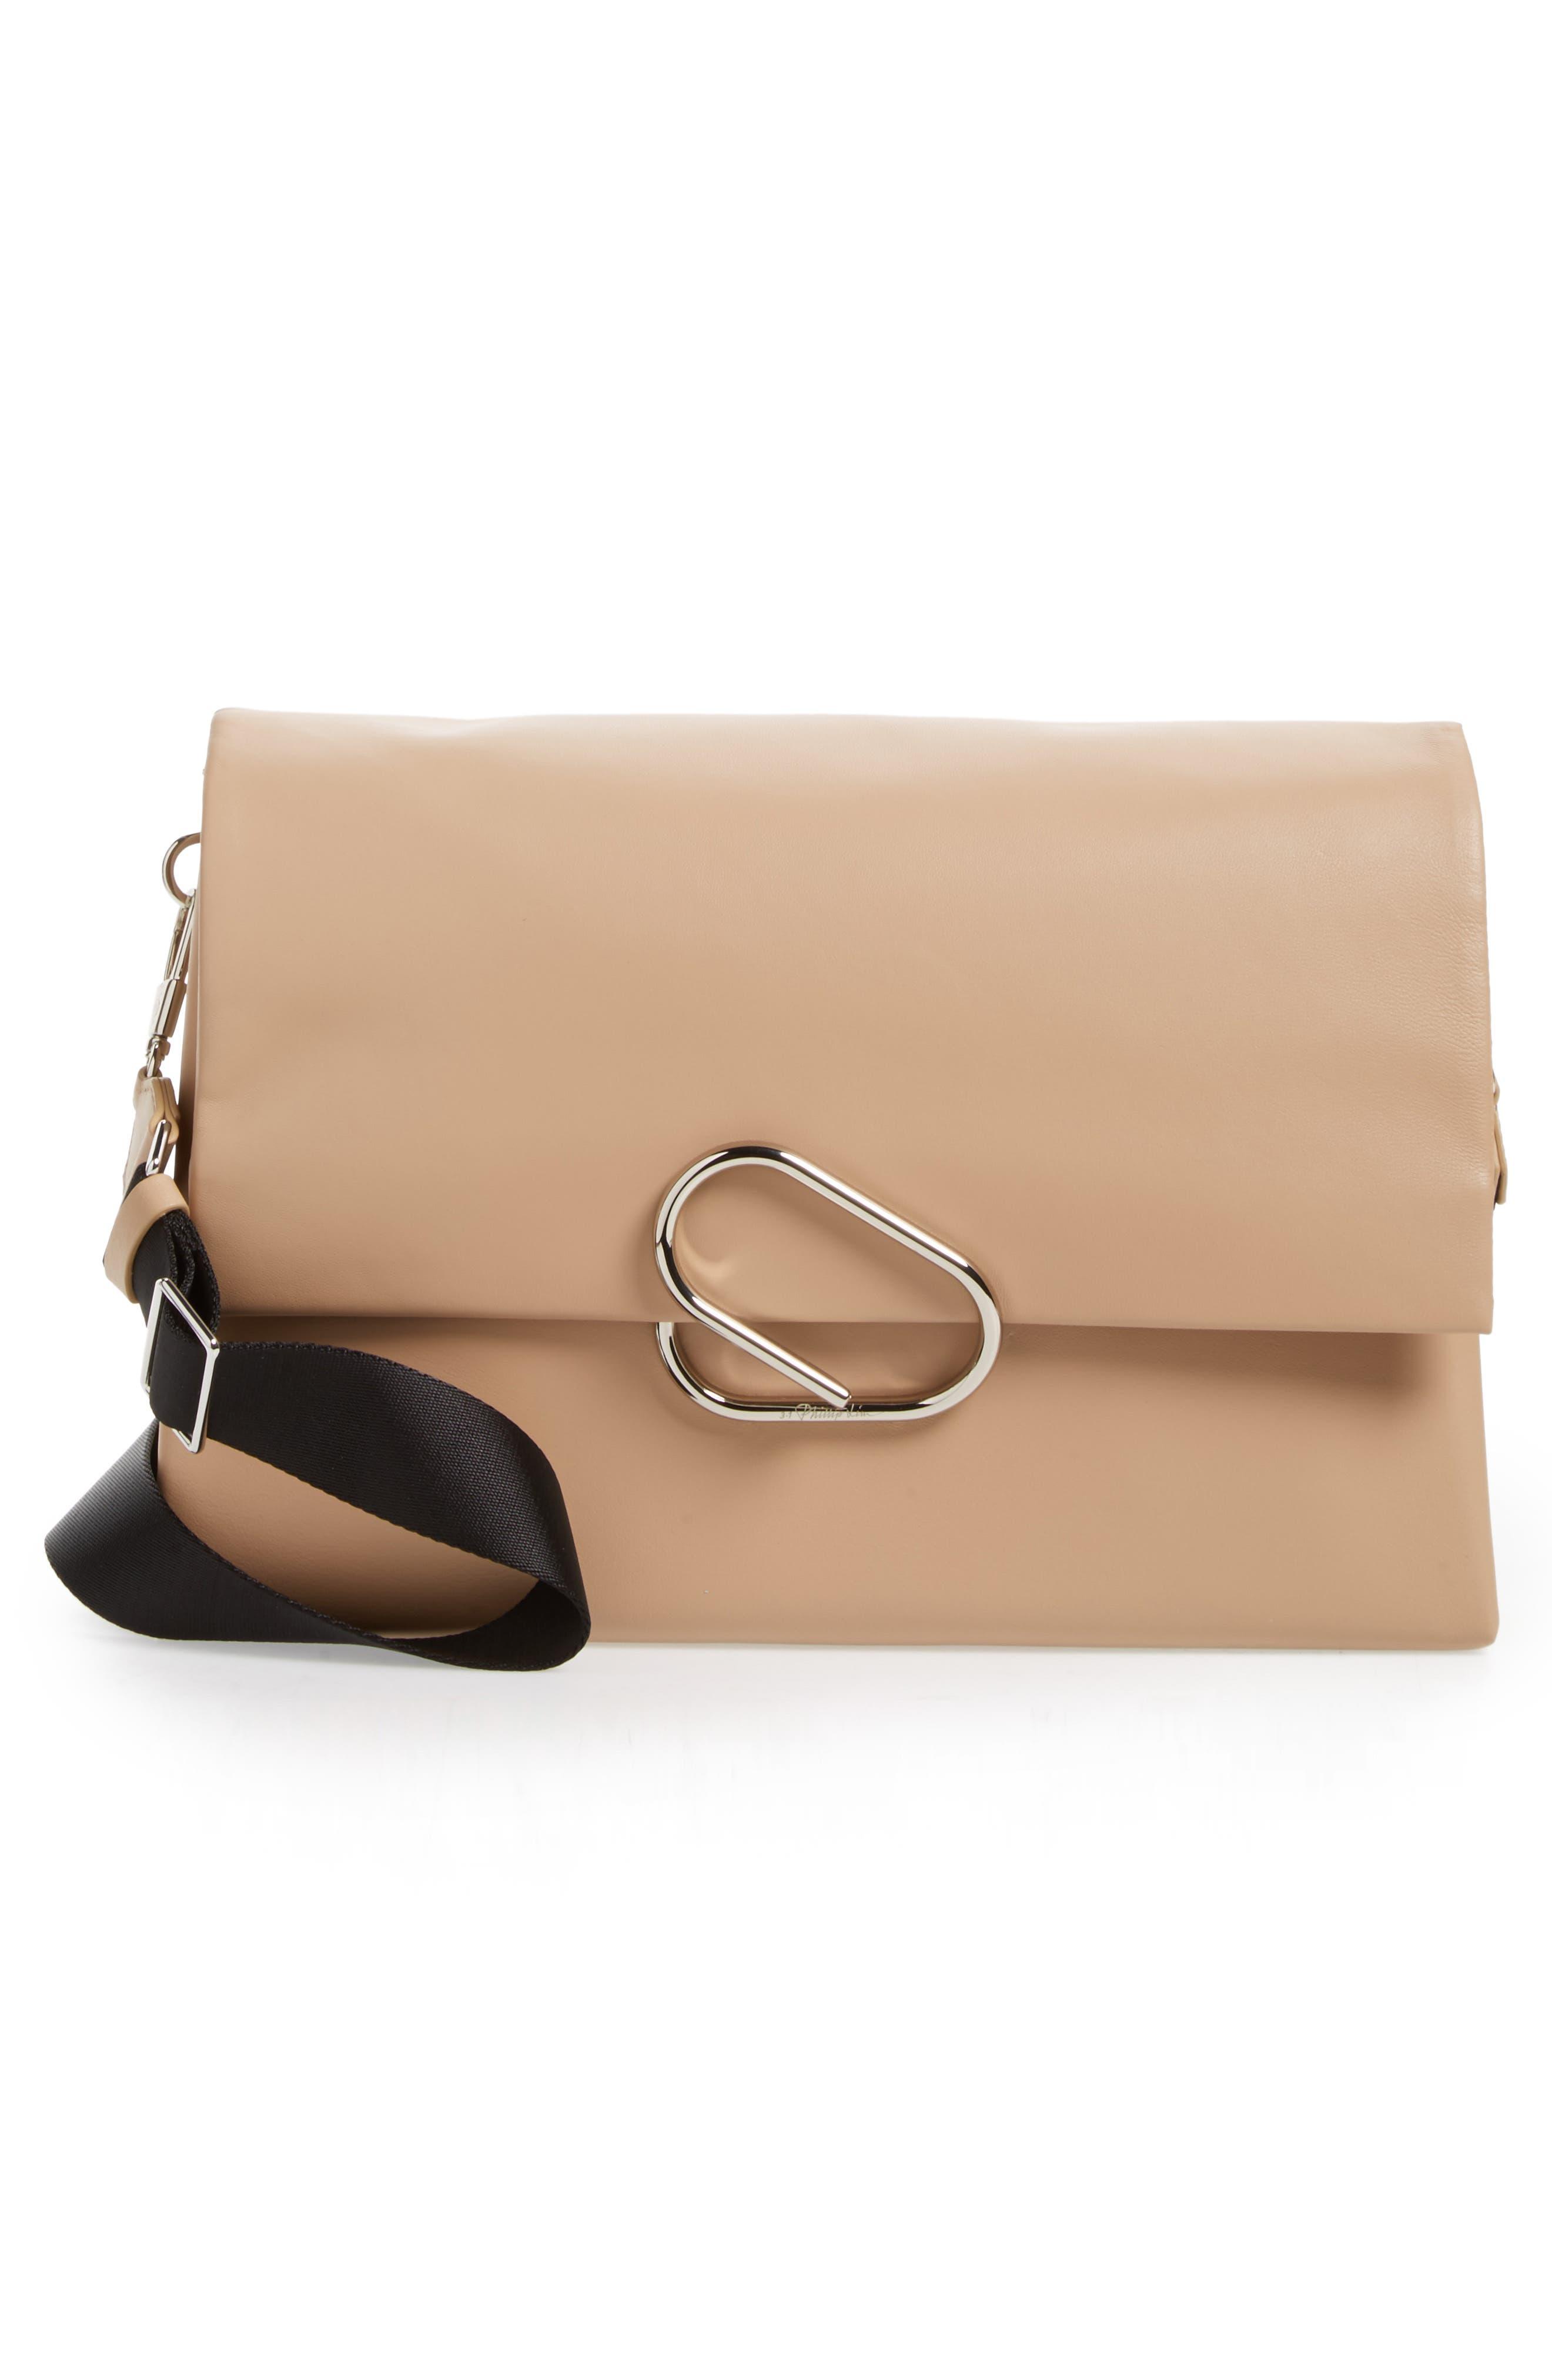 Oversized Alix Flap Leather Shoulder Bag,                             Alternate thumbnail 7, color,                             Fawn